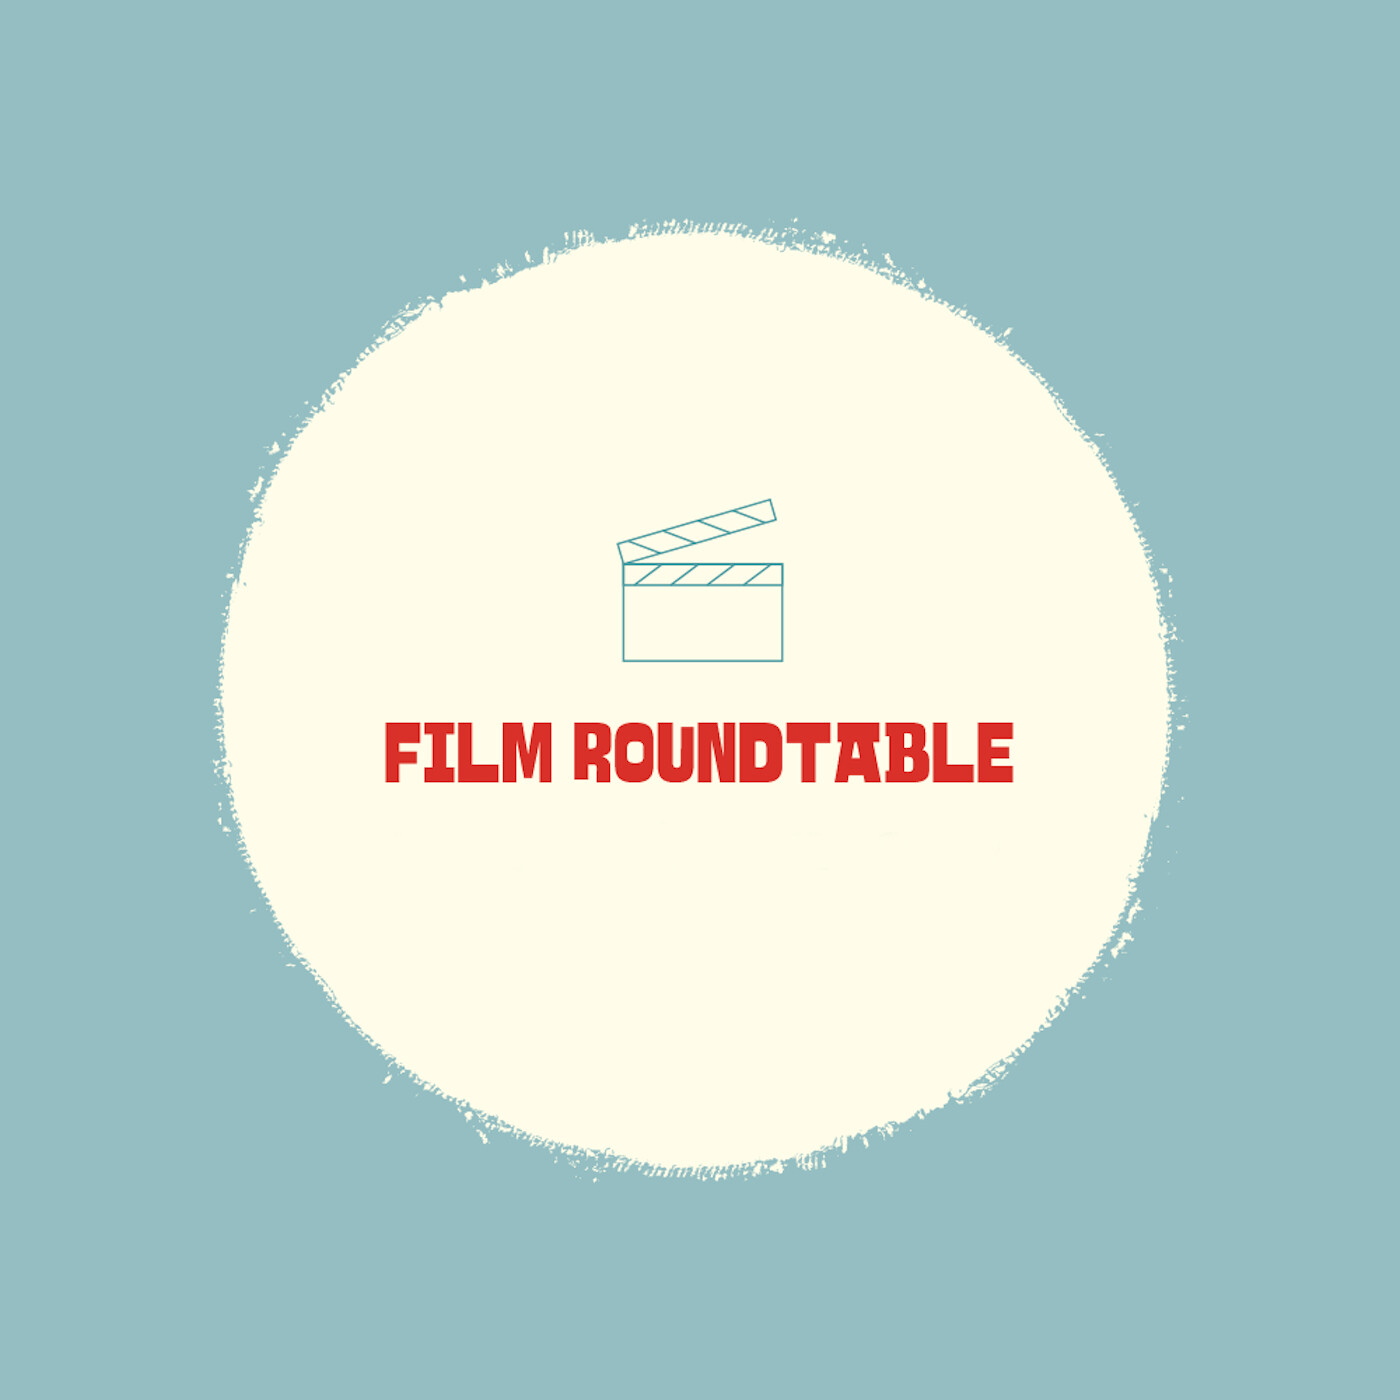 Darius Khondji, Bradford Young, Doug Torres - Film Roundtable #2